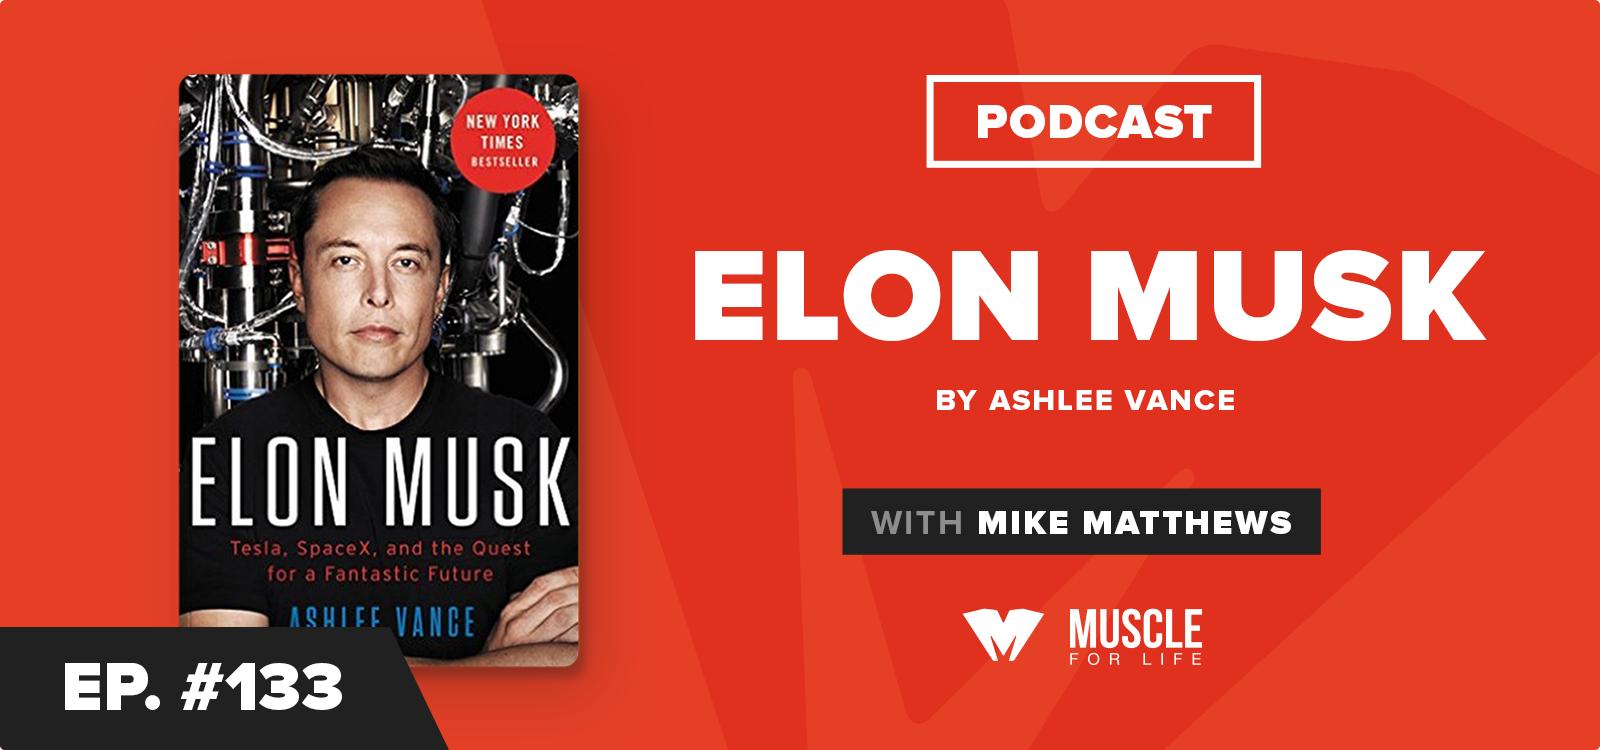 MFL Book Club Podcast: Elon Musk by Ashlee Vance